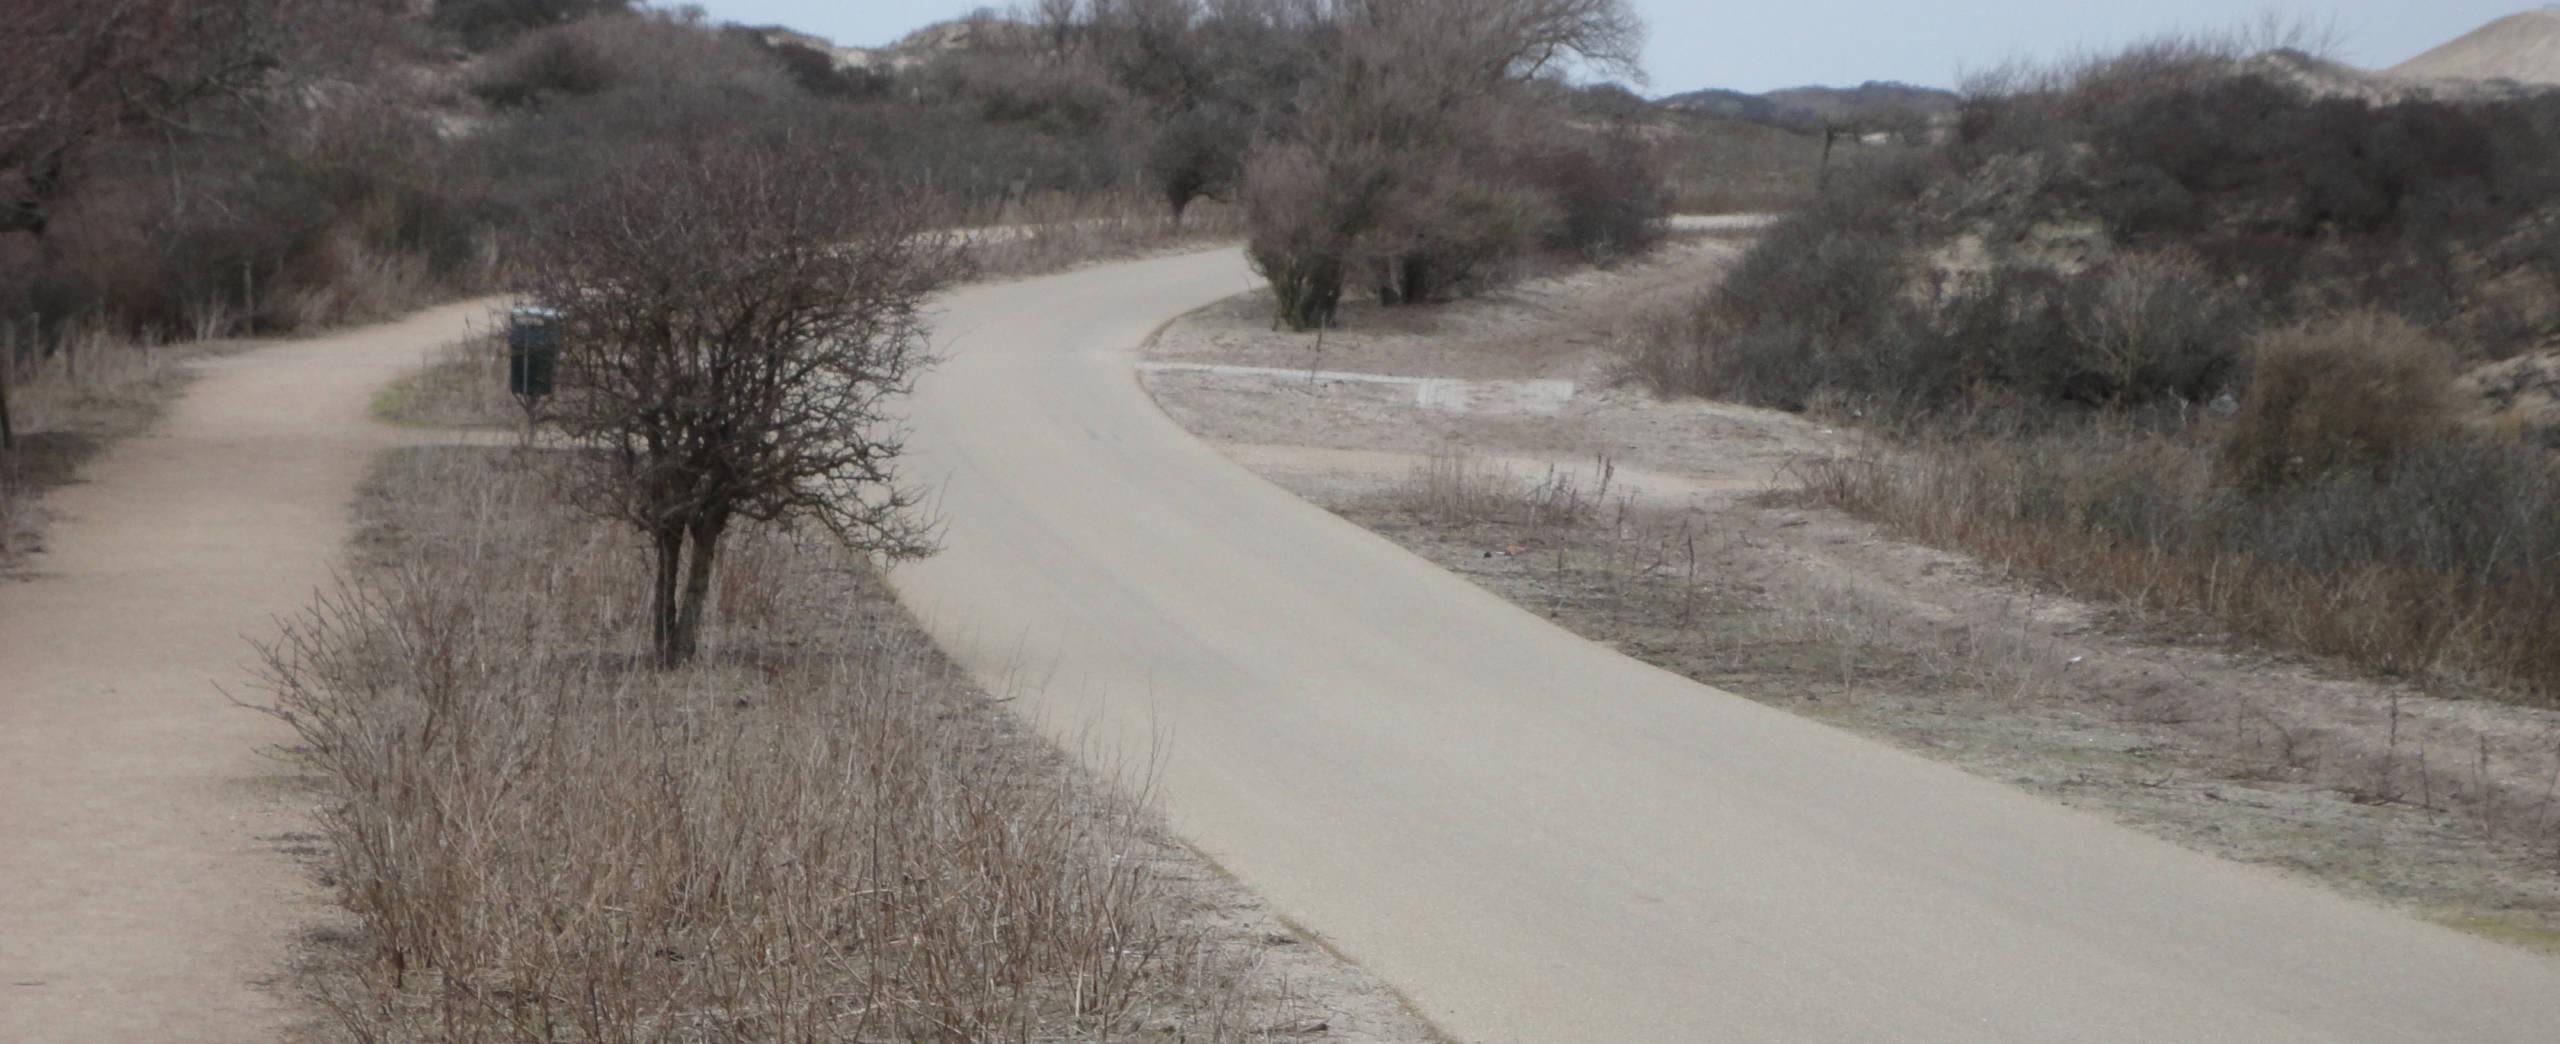 Wit asfalt in Kijkduin